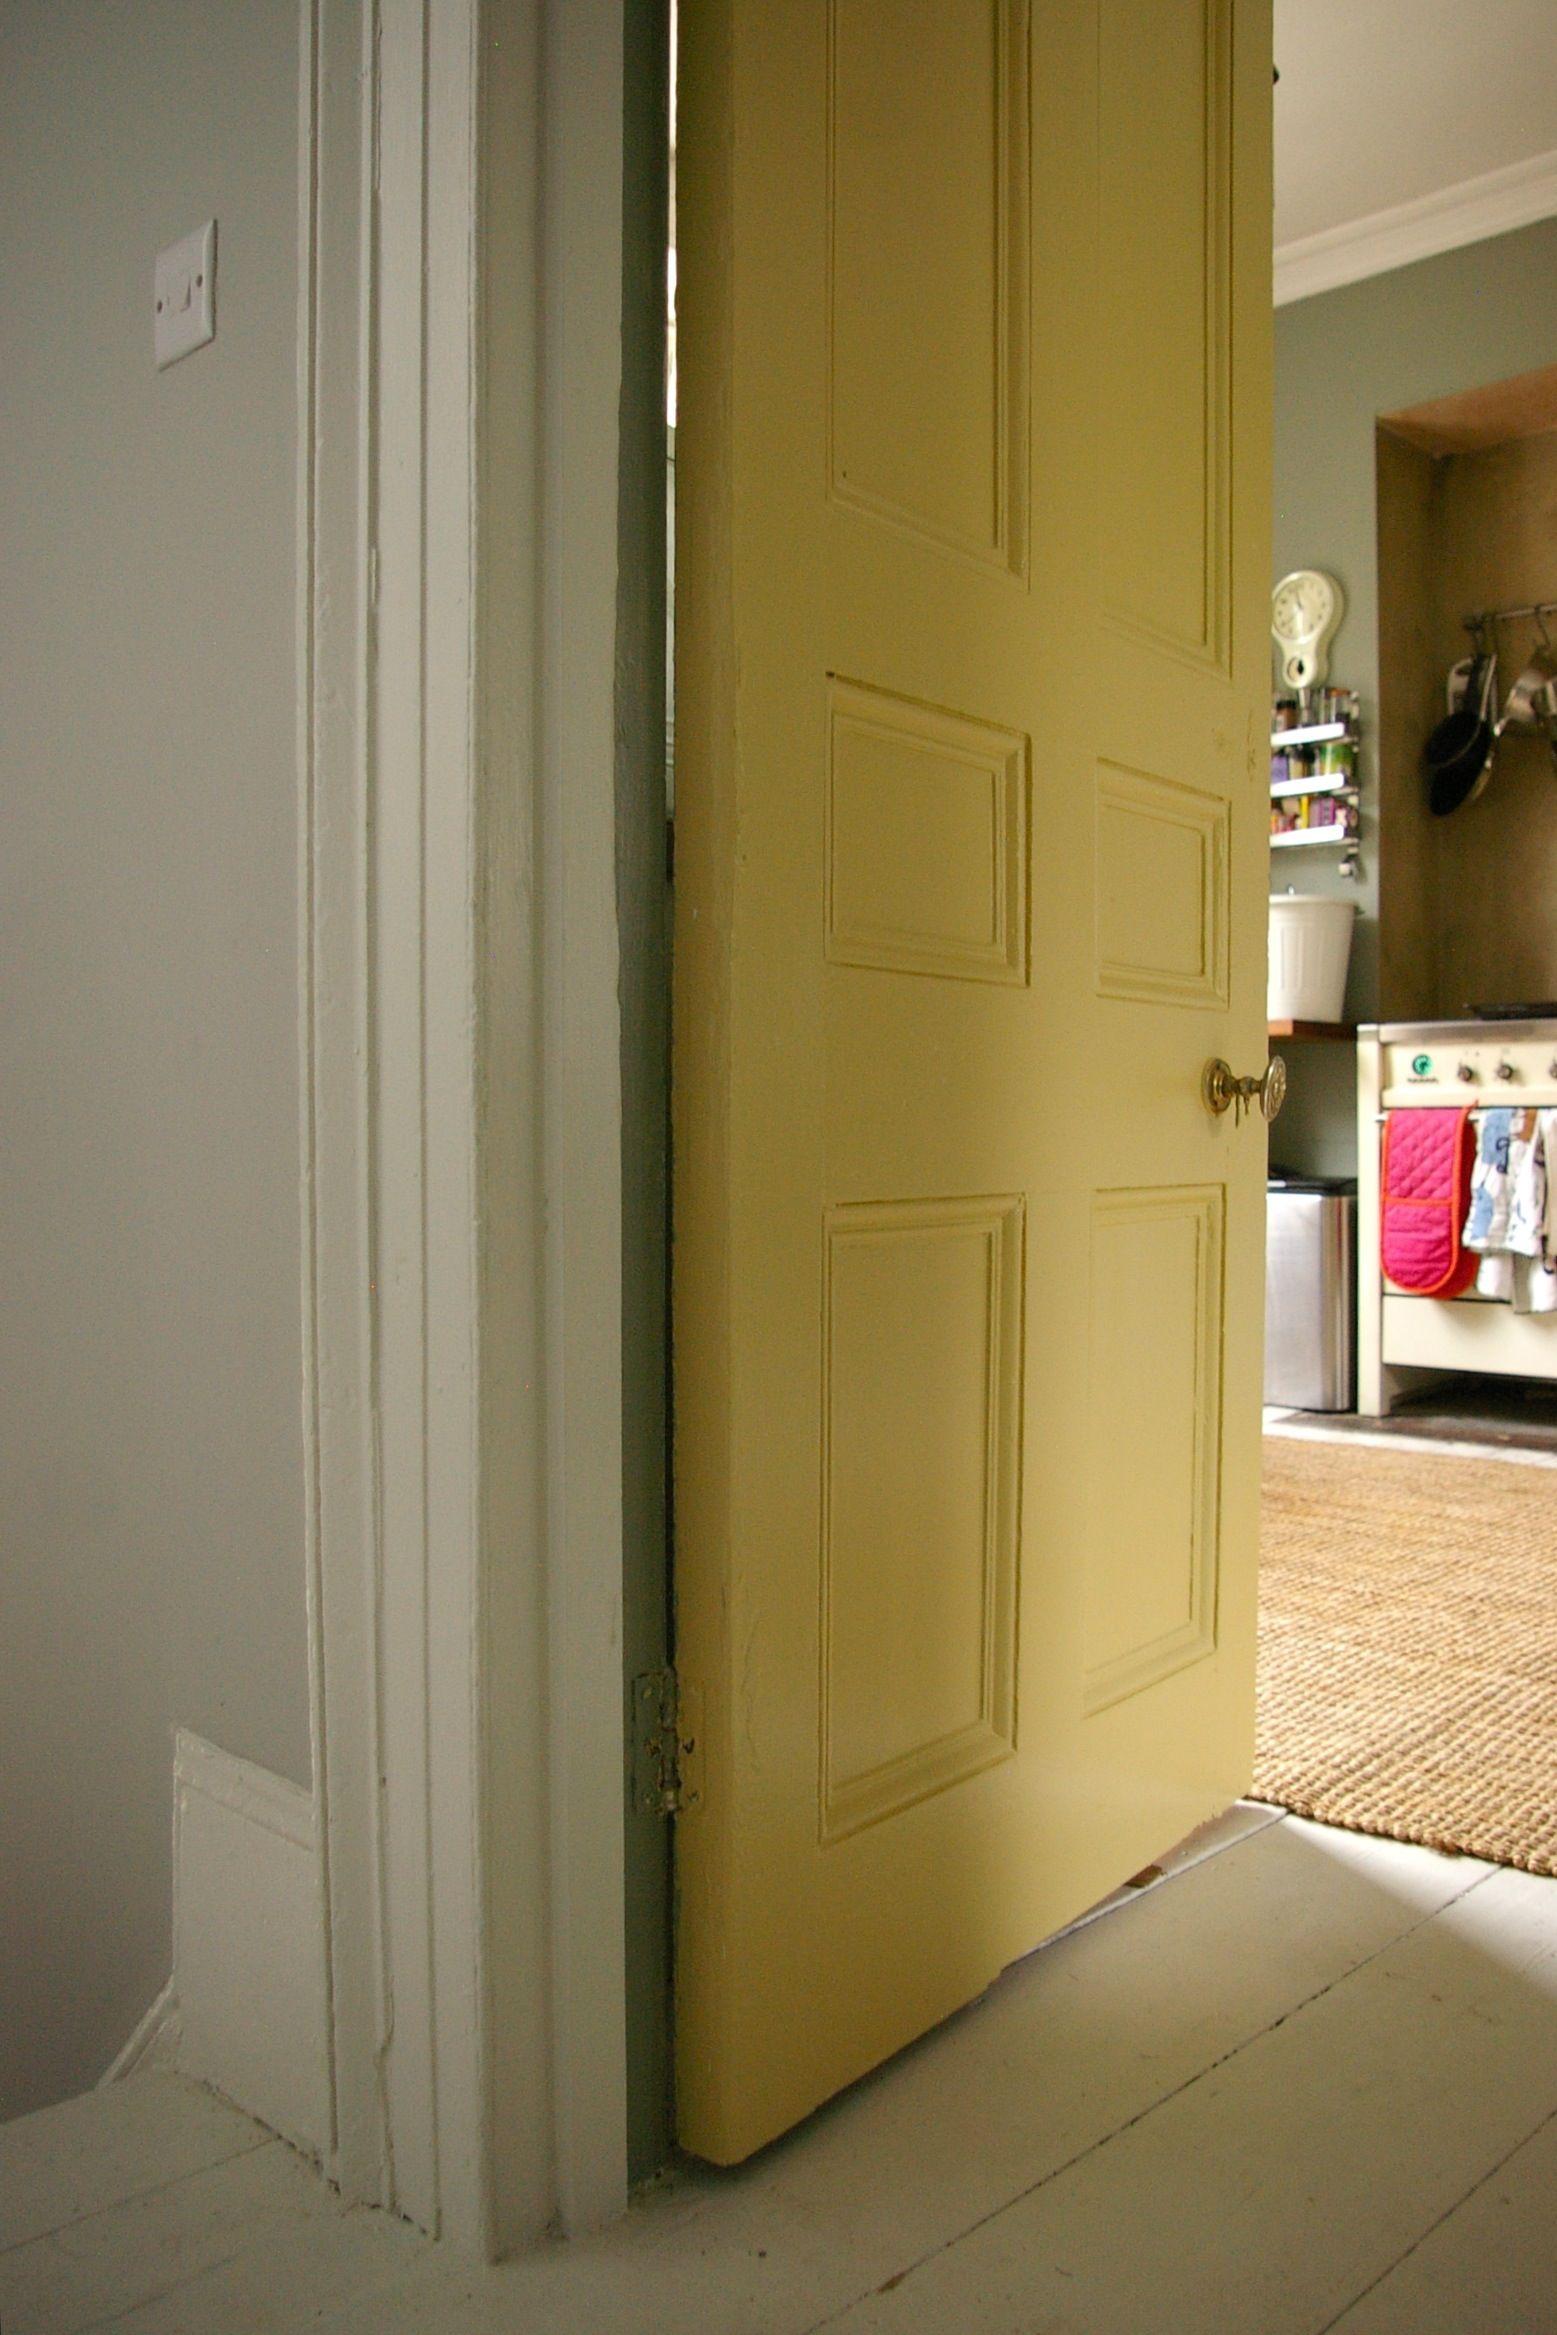 https://klausandheidi.files.wordpress.com/2013/08/hall04.jpg hallway ...